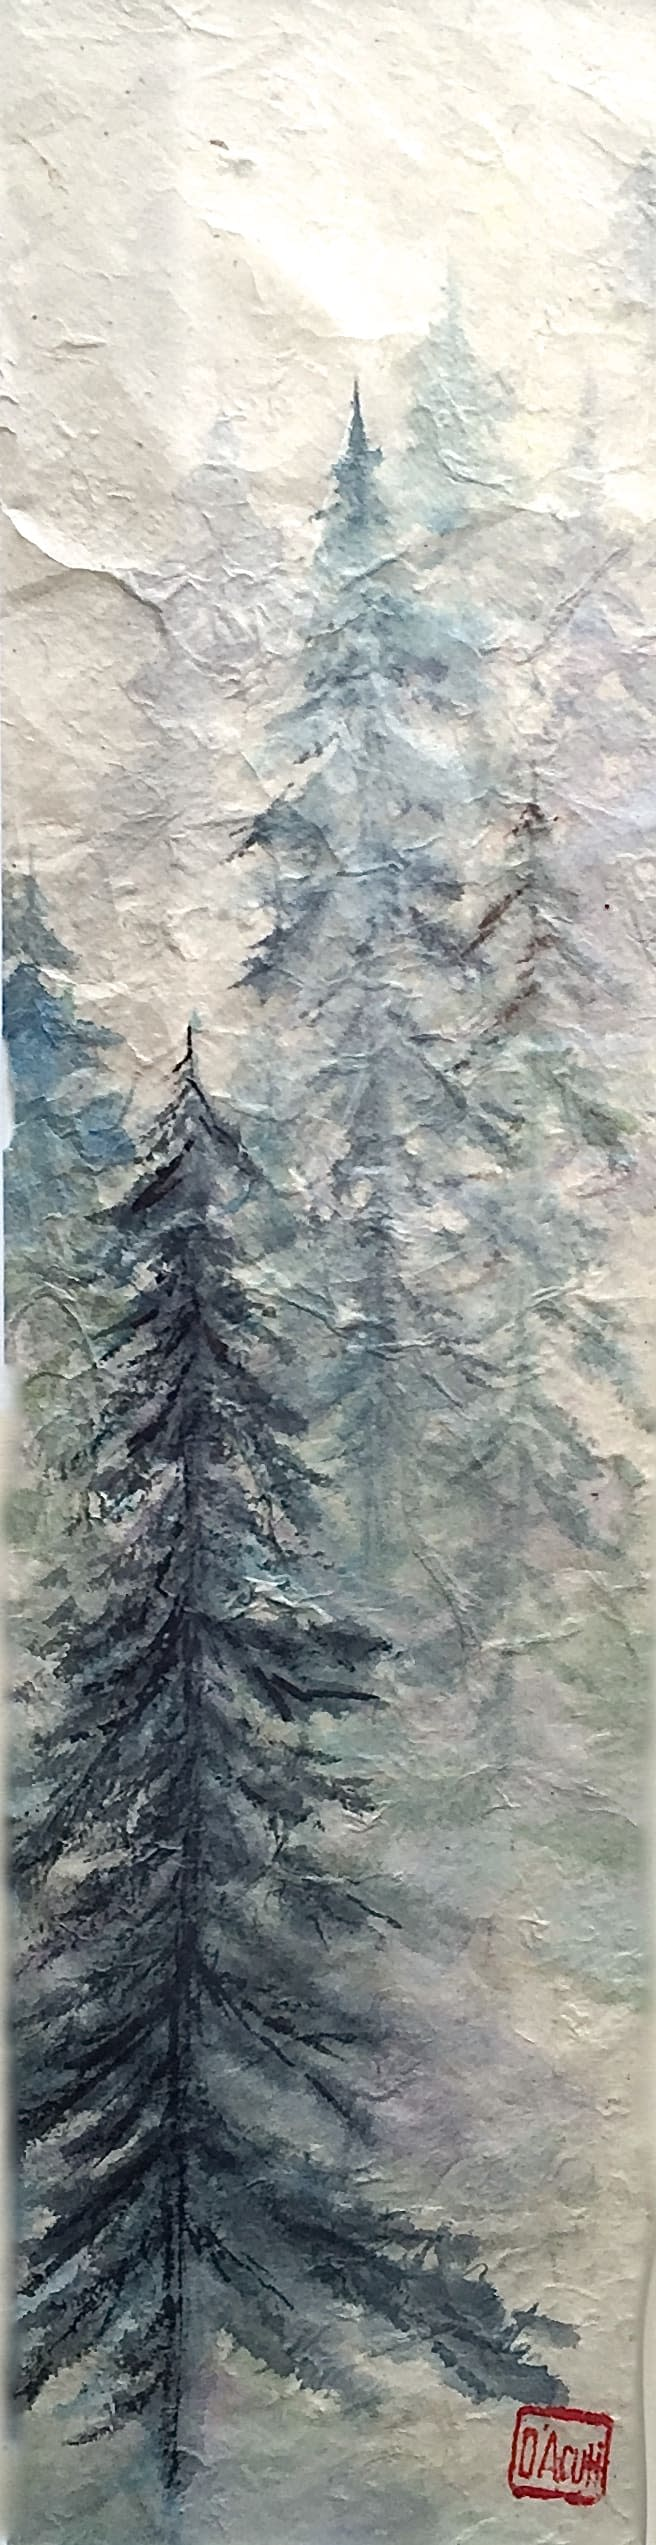 Blue green forest nri68e